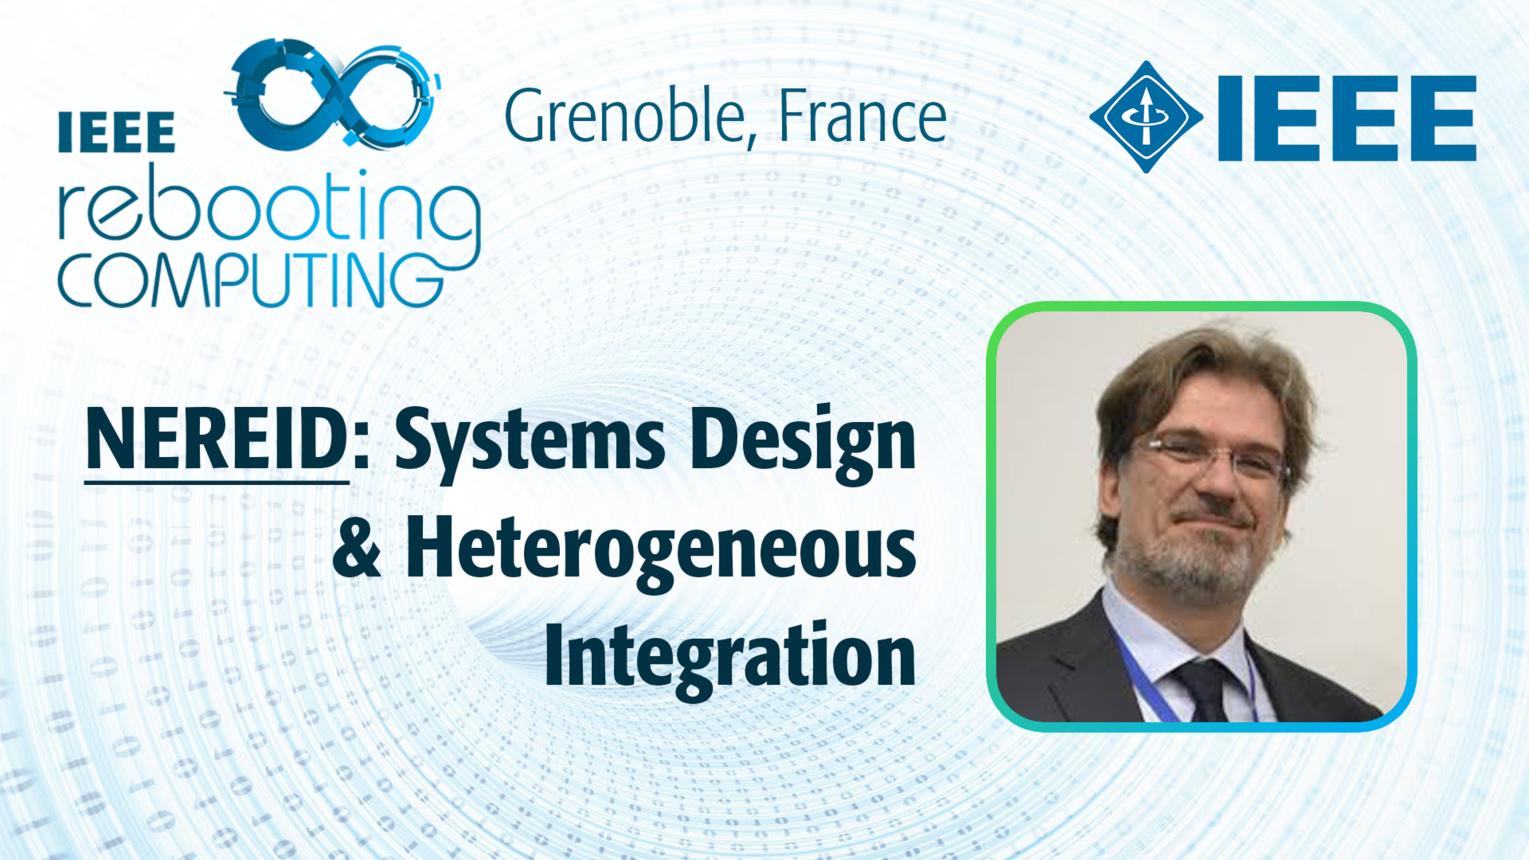 NEREID: Systems Design & Heterogeneous Integration: Danilo Demarchi at INC 2019